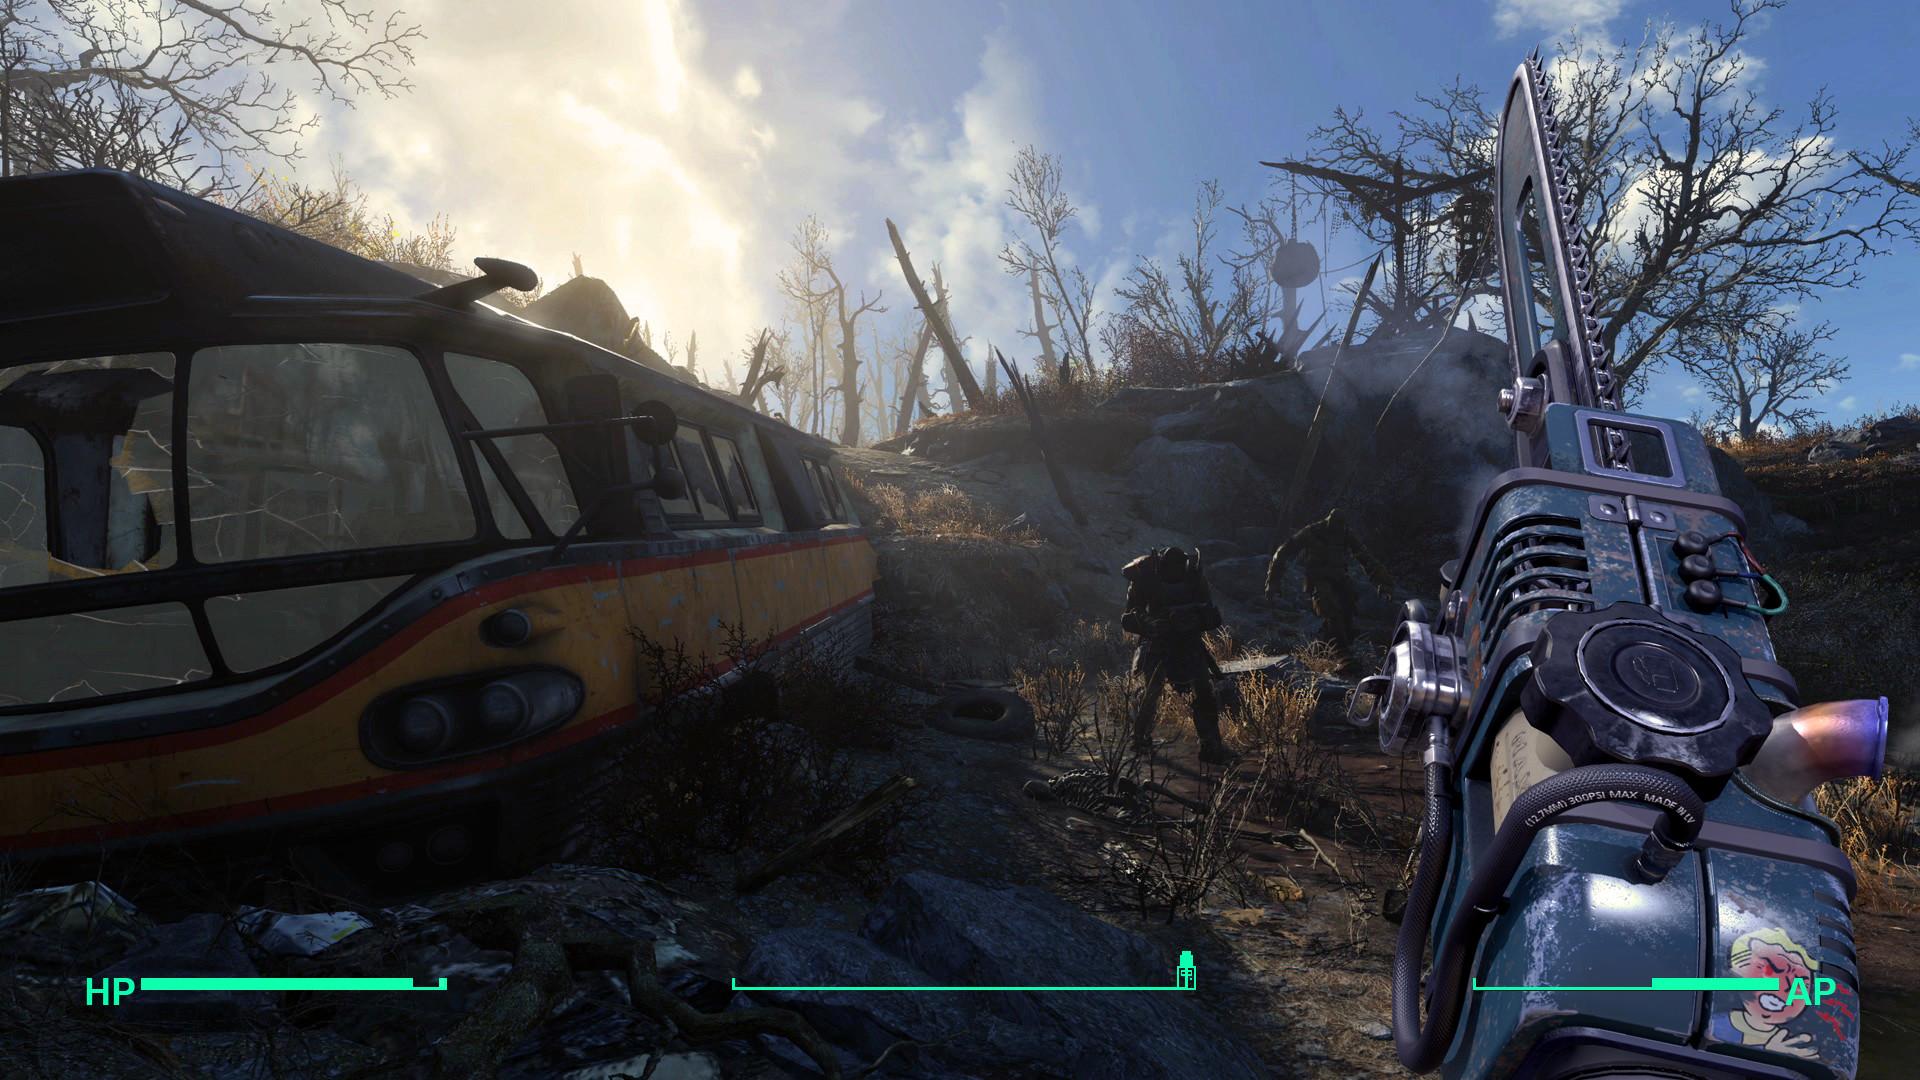 ArtStation - Fallout 4 The Ripper, Kaspars Pavlovskis